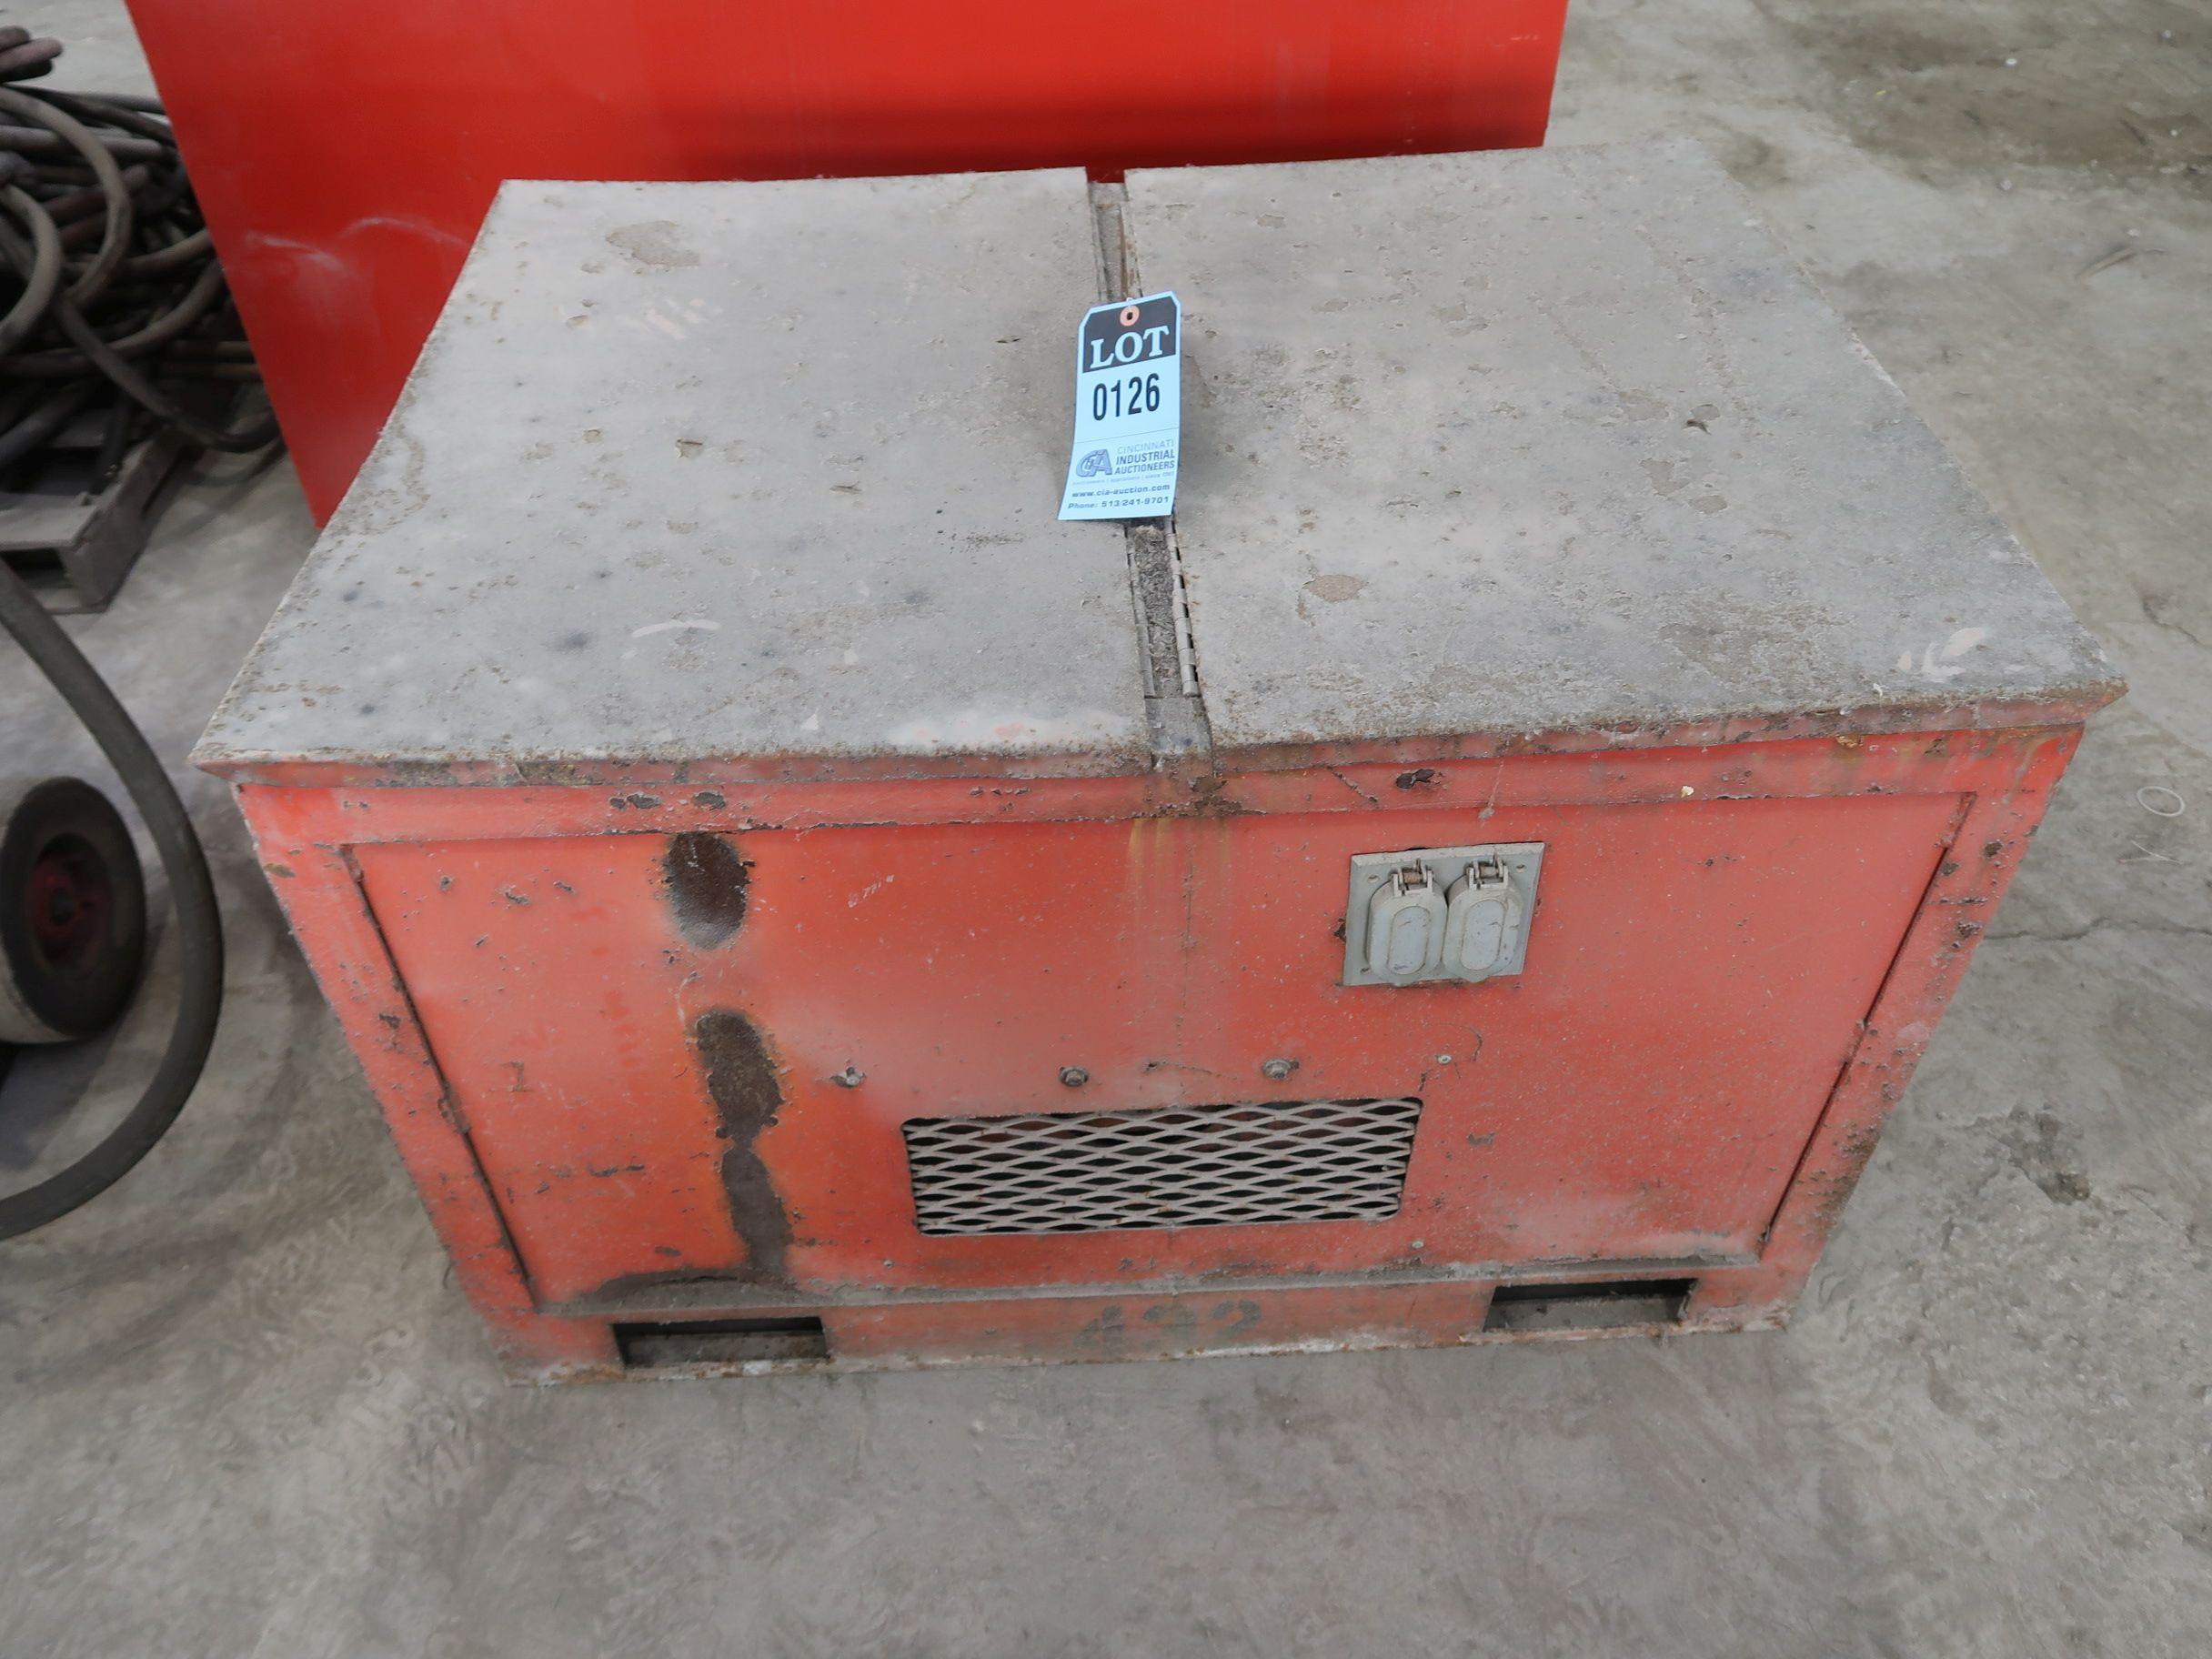 Lot 126 - 5,000 WATT HOMELITE CABINET ENCLOSED GAS POWERED GENERATOR